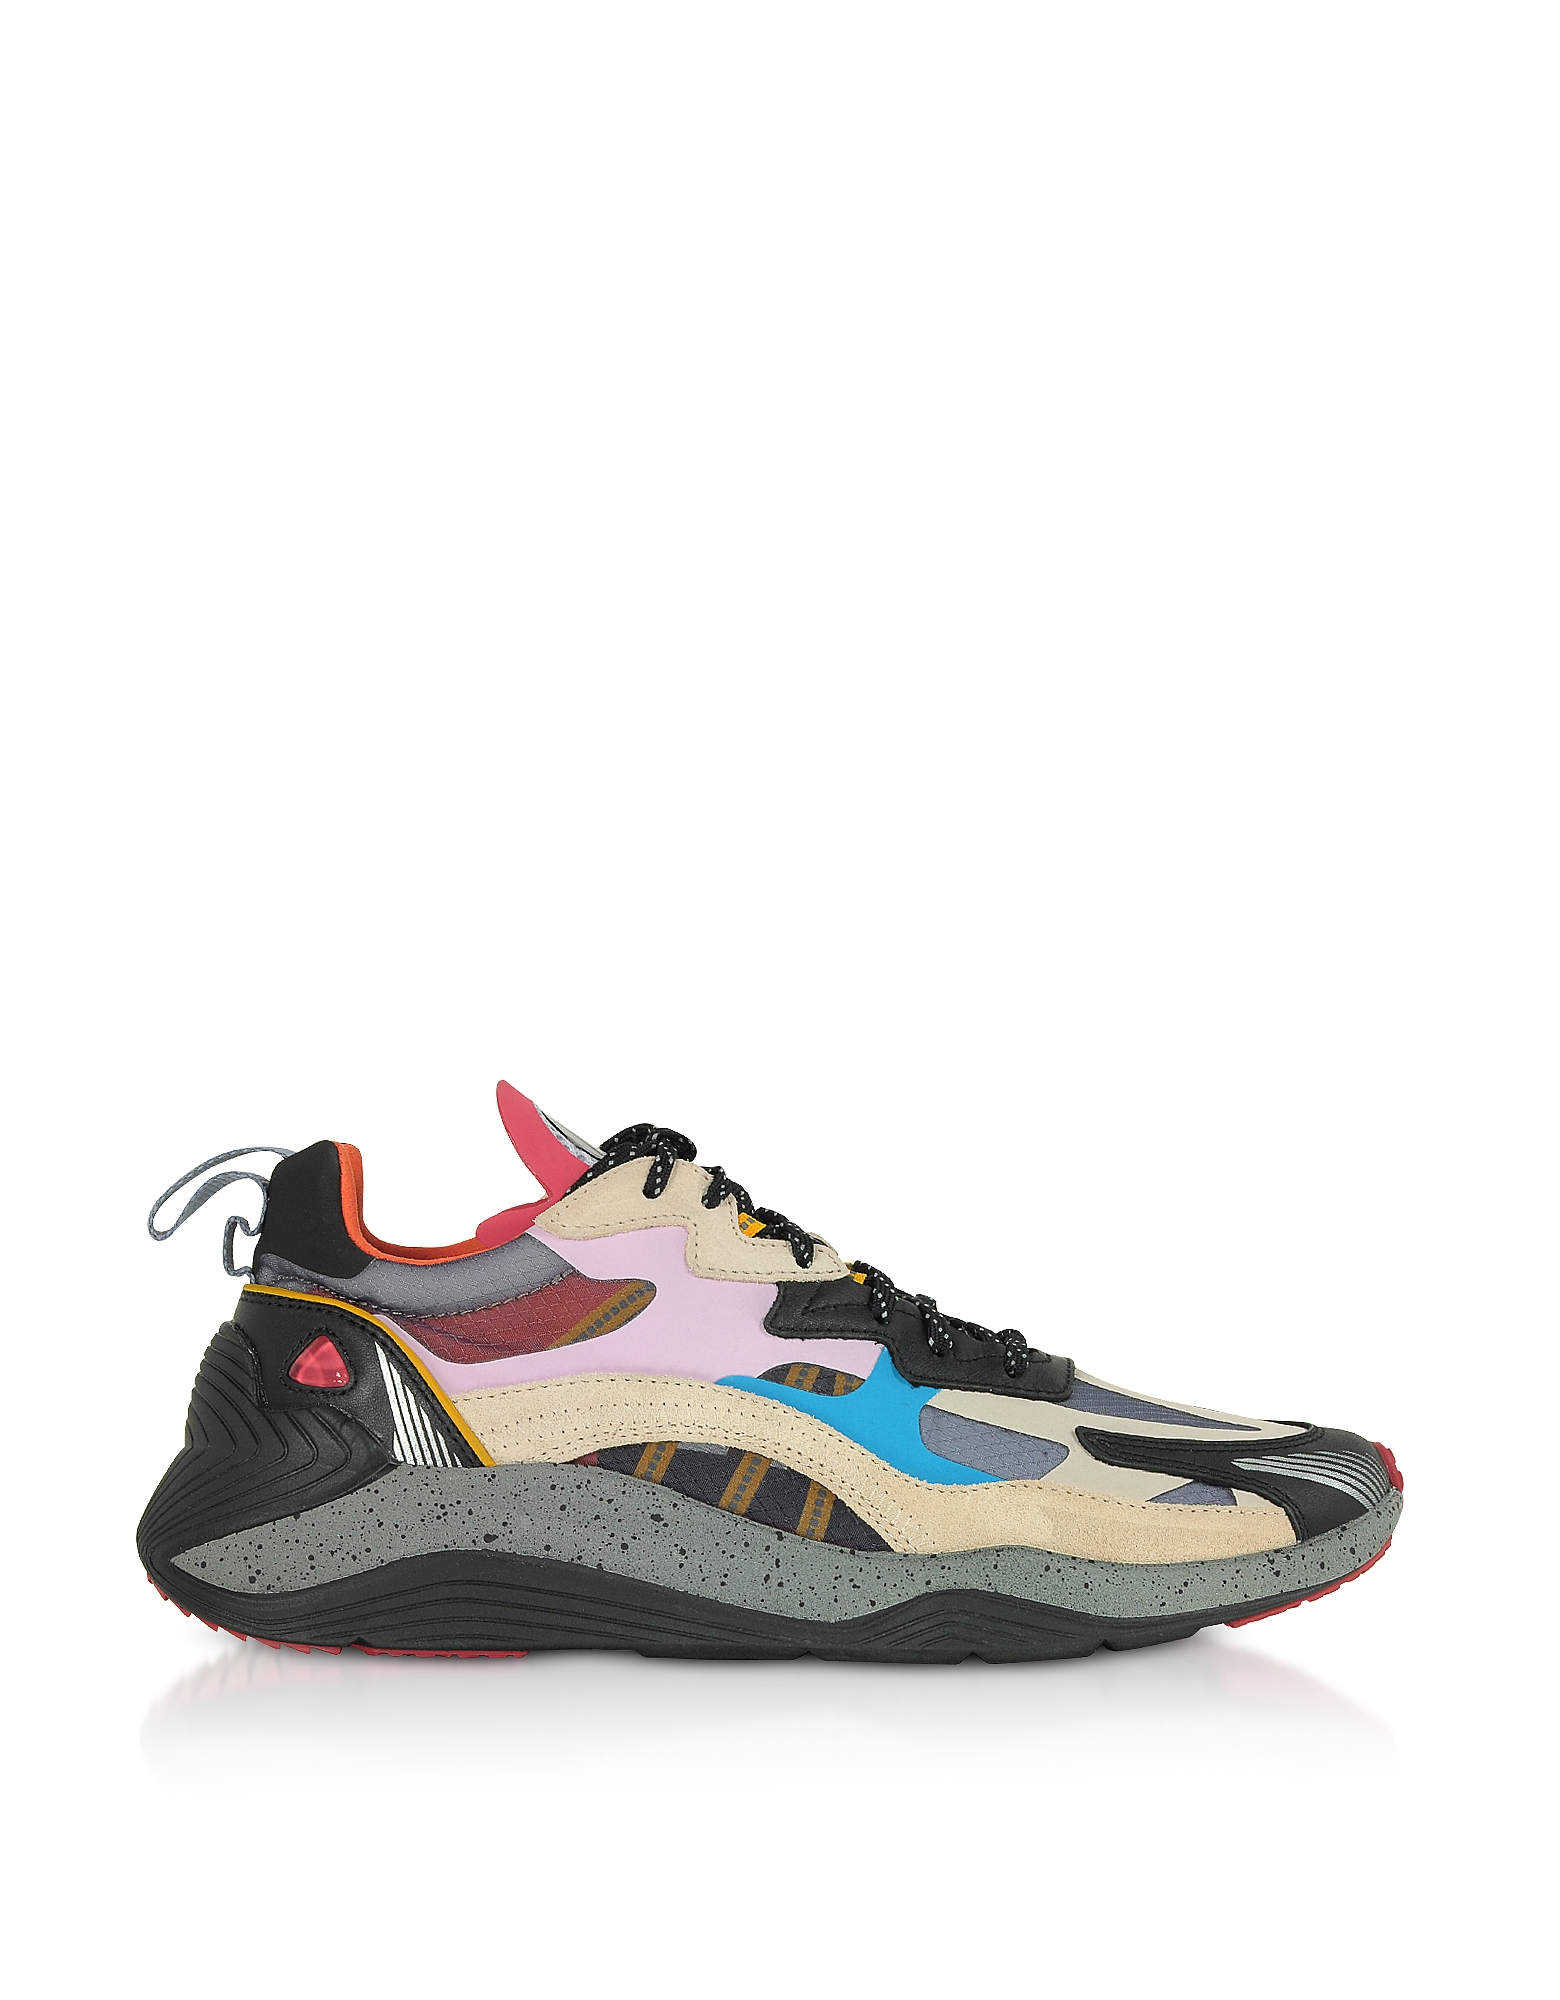 McQ Alexander McQueen Designer Shoes, Daku 2.0 Bubblegum Mix Sneakers